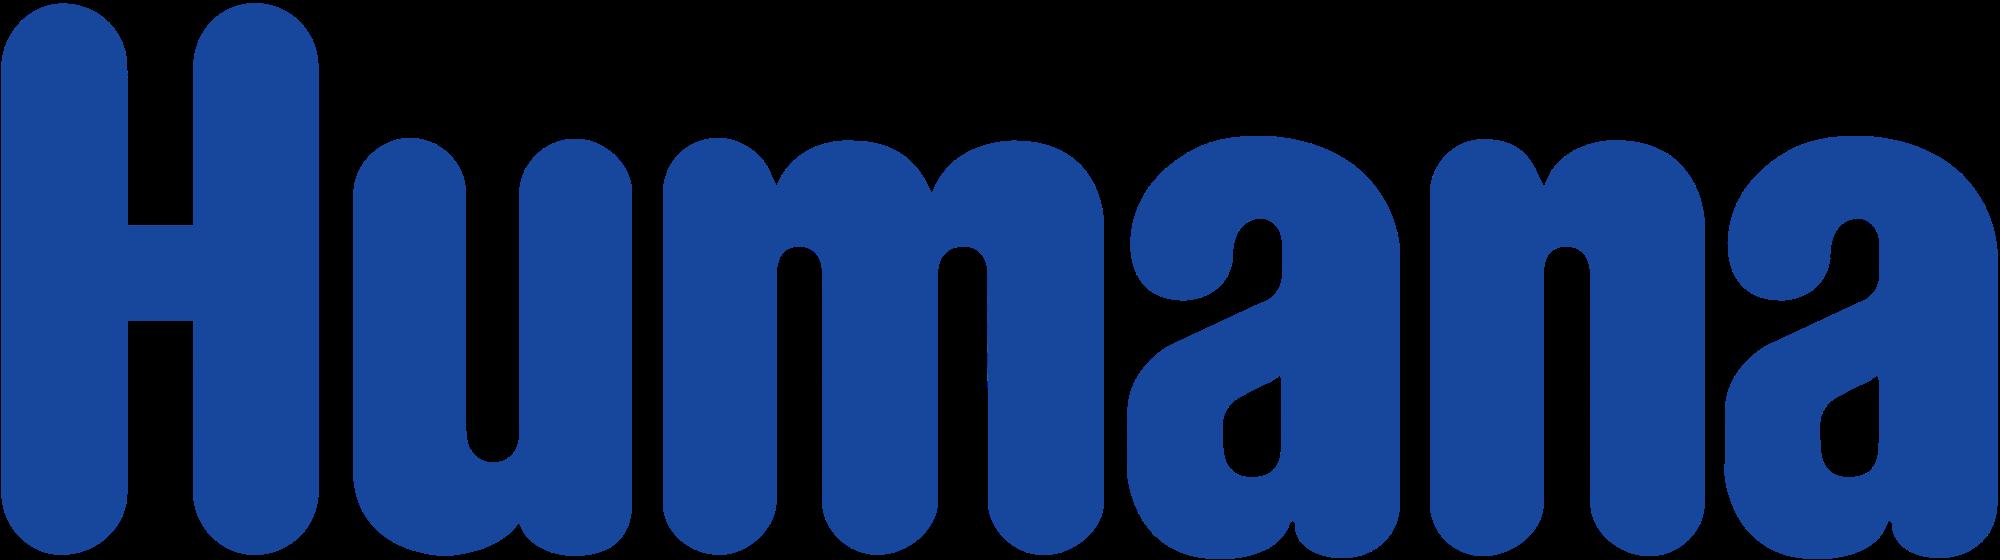 Humana logo png » PNG Image.